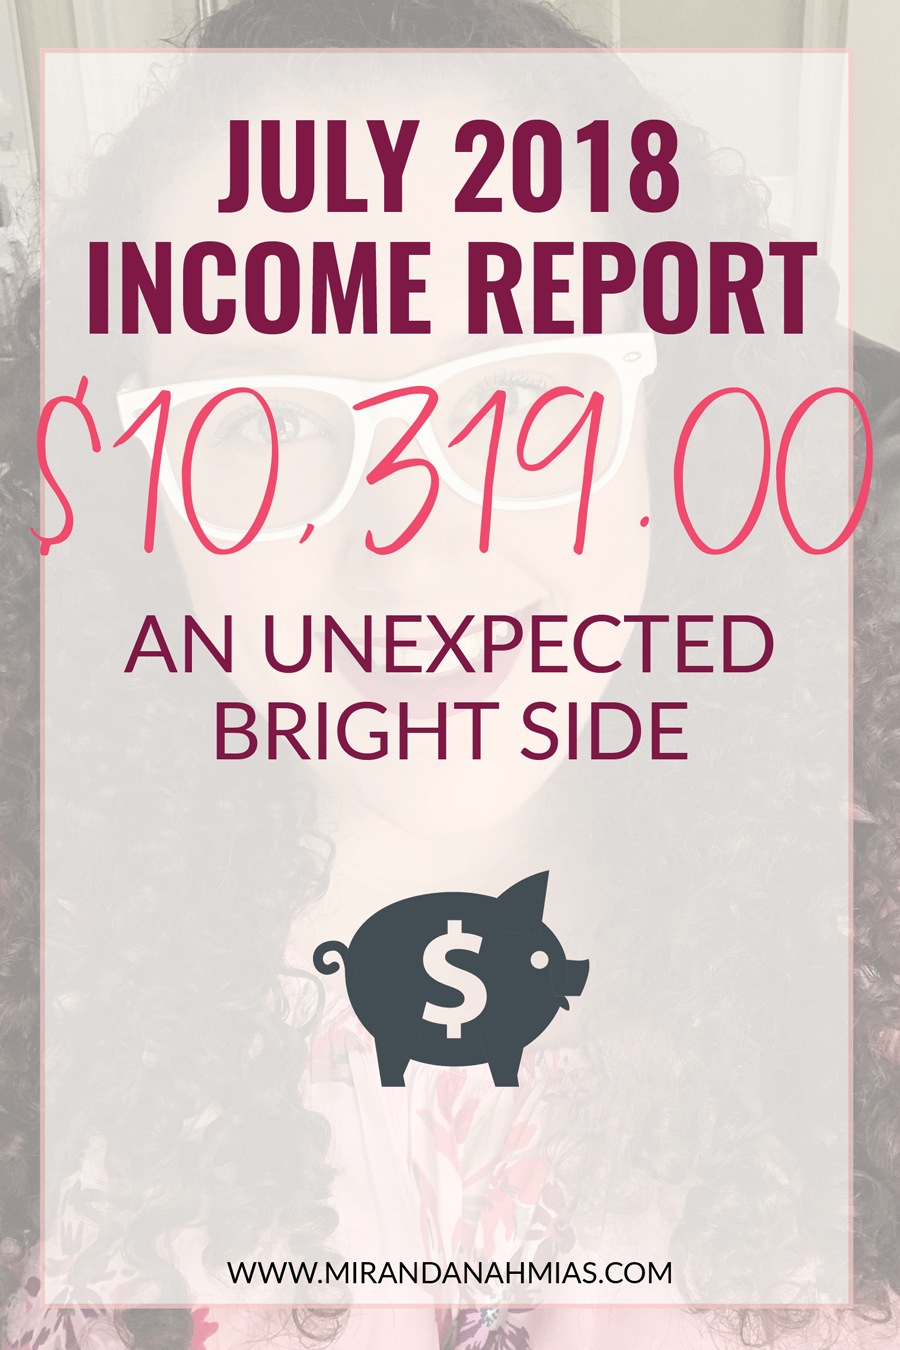 July 2018 Income Report | Miranda Nahmias & Co. Systematic Marketing